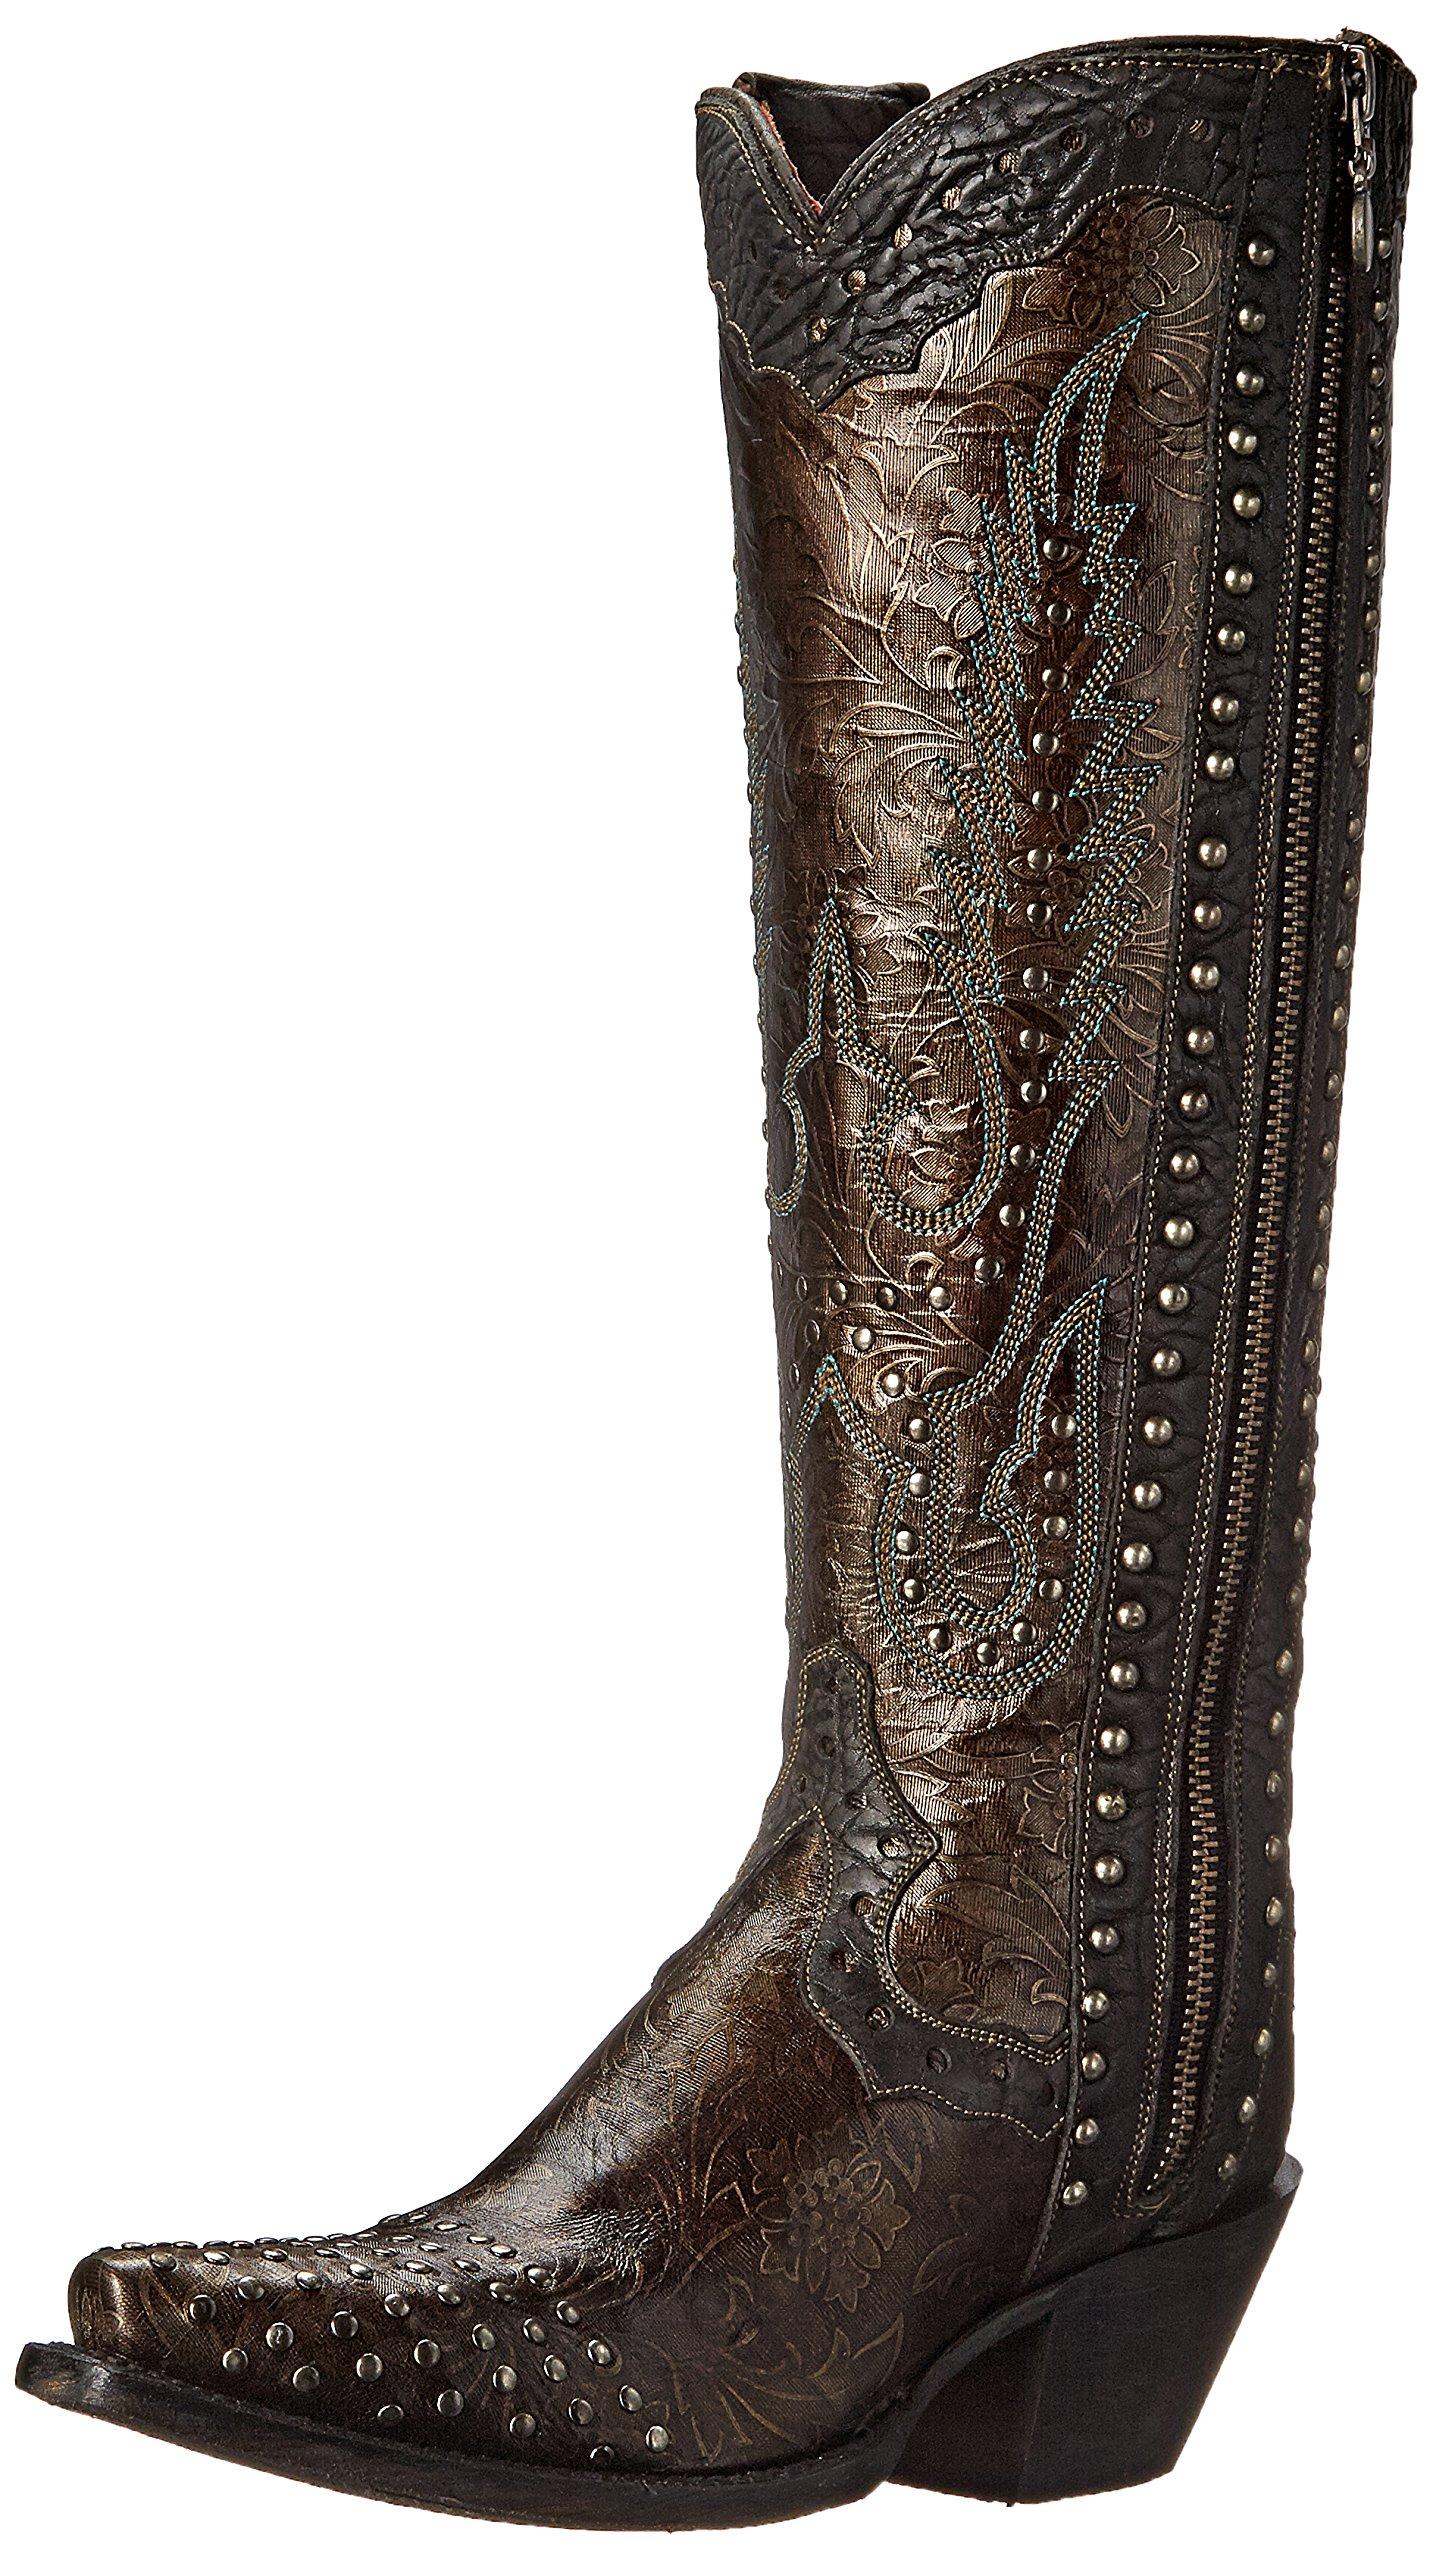 Dan Post Women's Tempted Western Boot, Dark Taupe, 9.5 M US